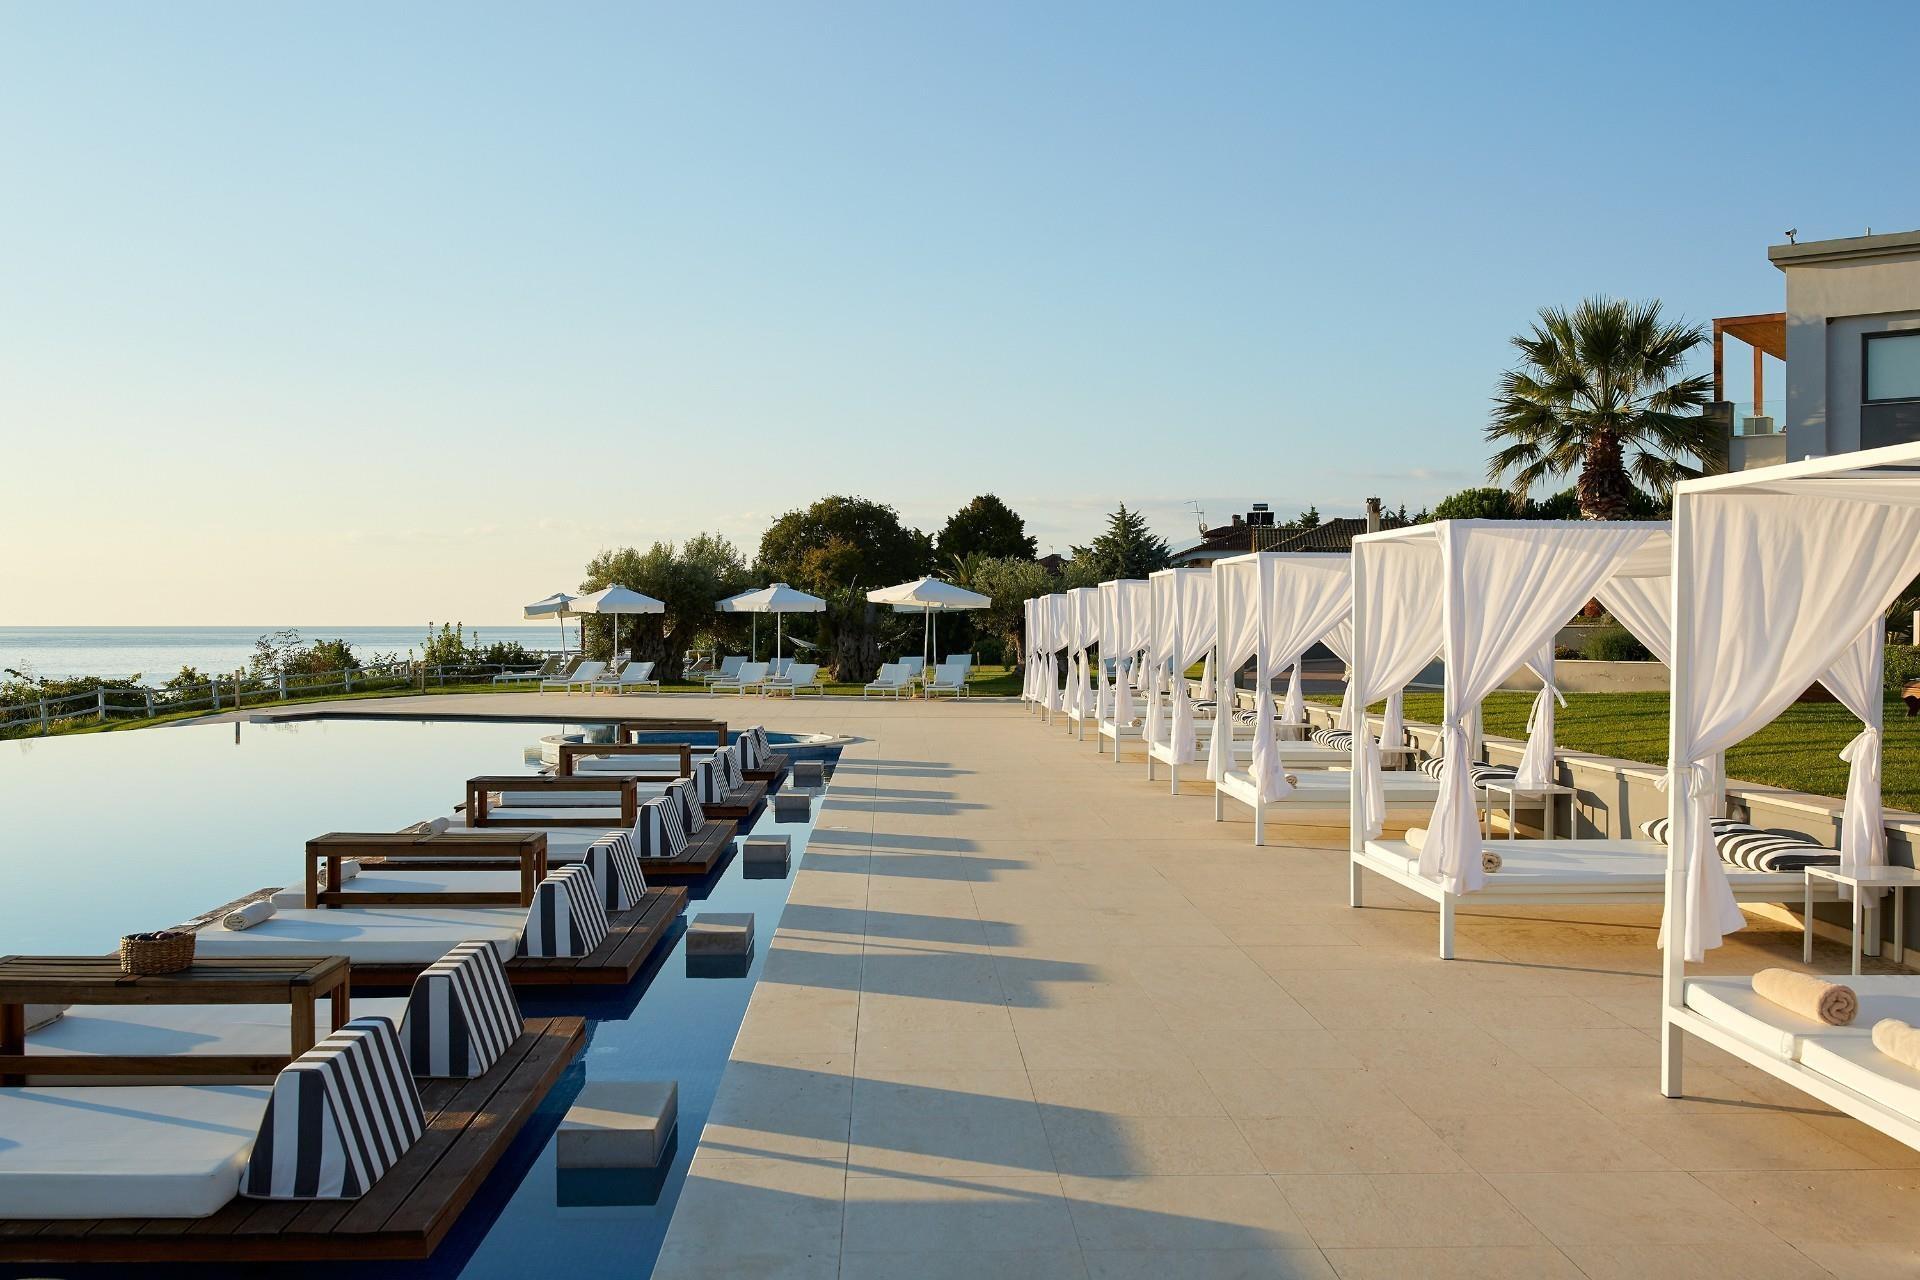 cavo-olympo-luxury-hotel-spa-genel-0019